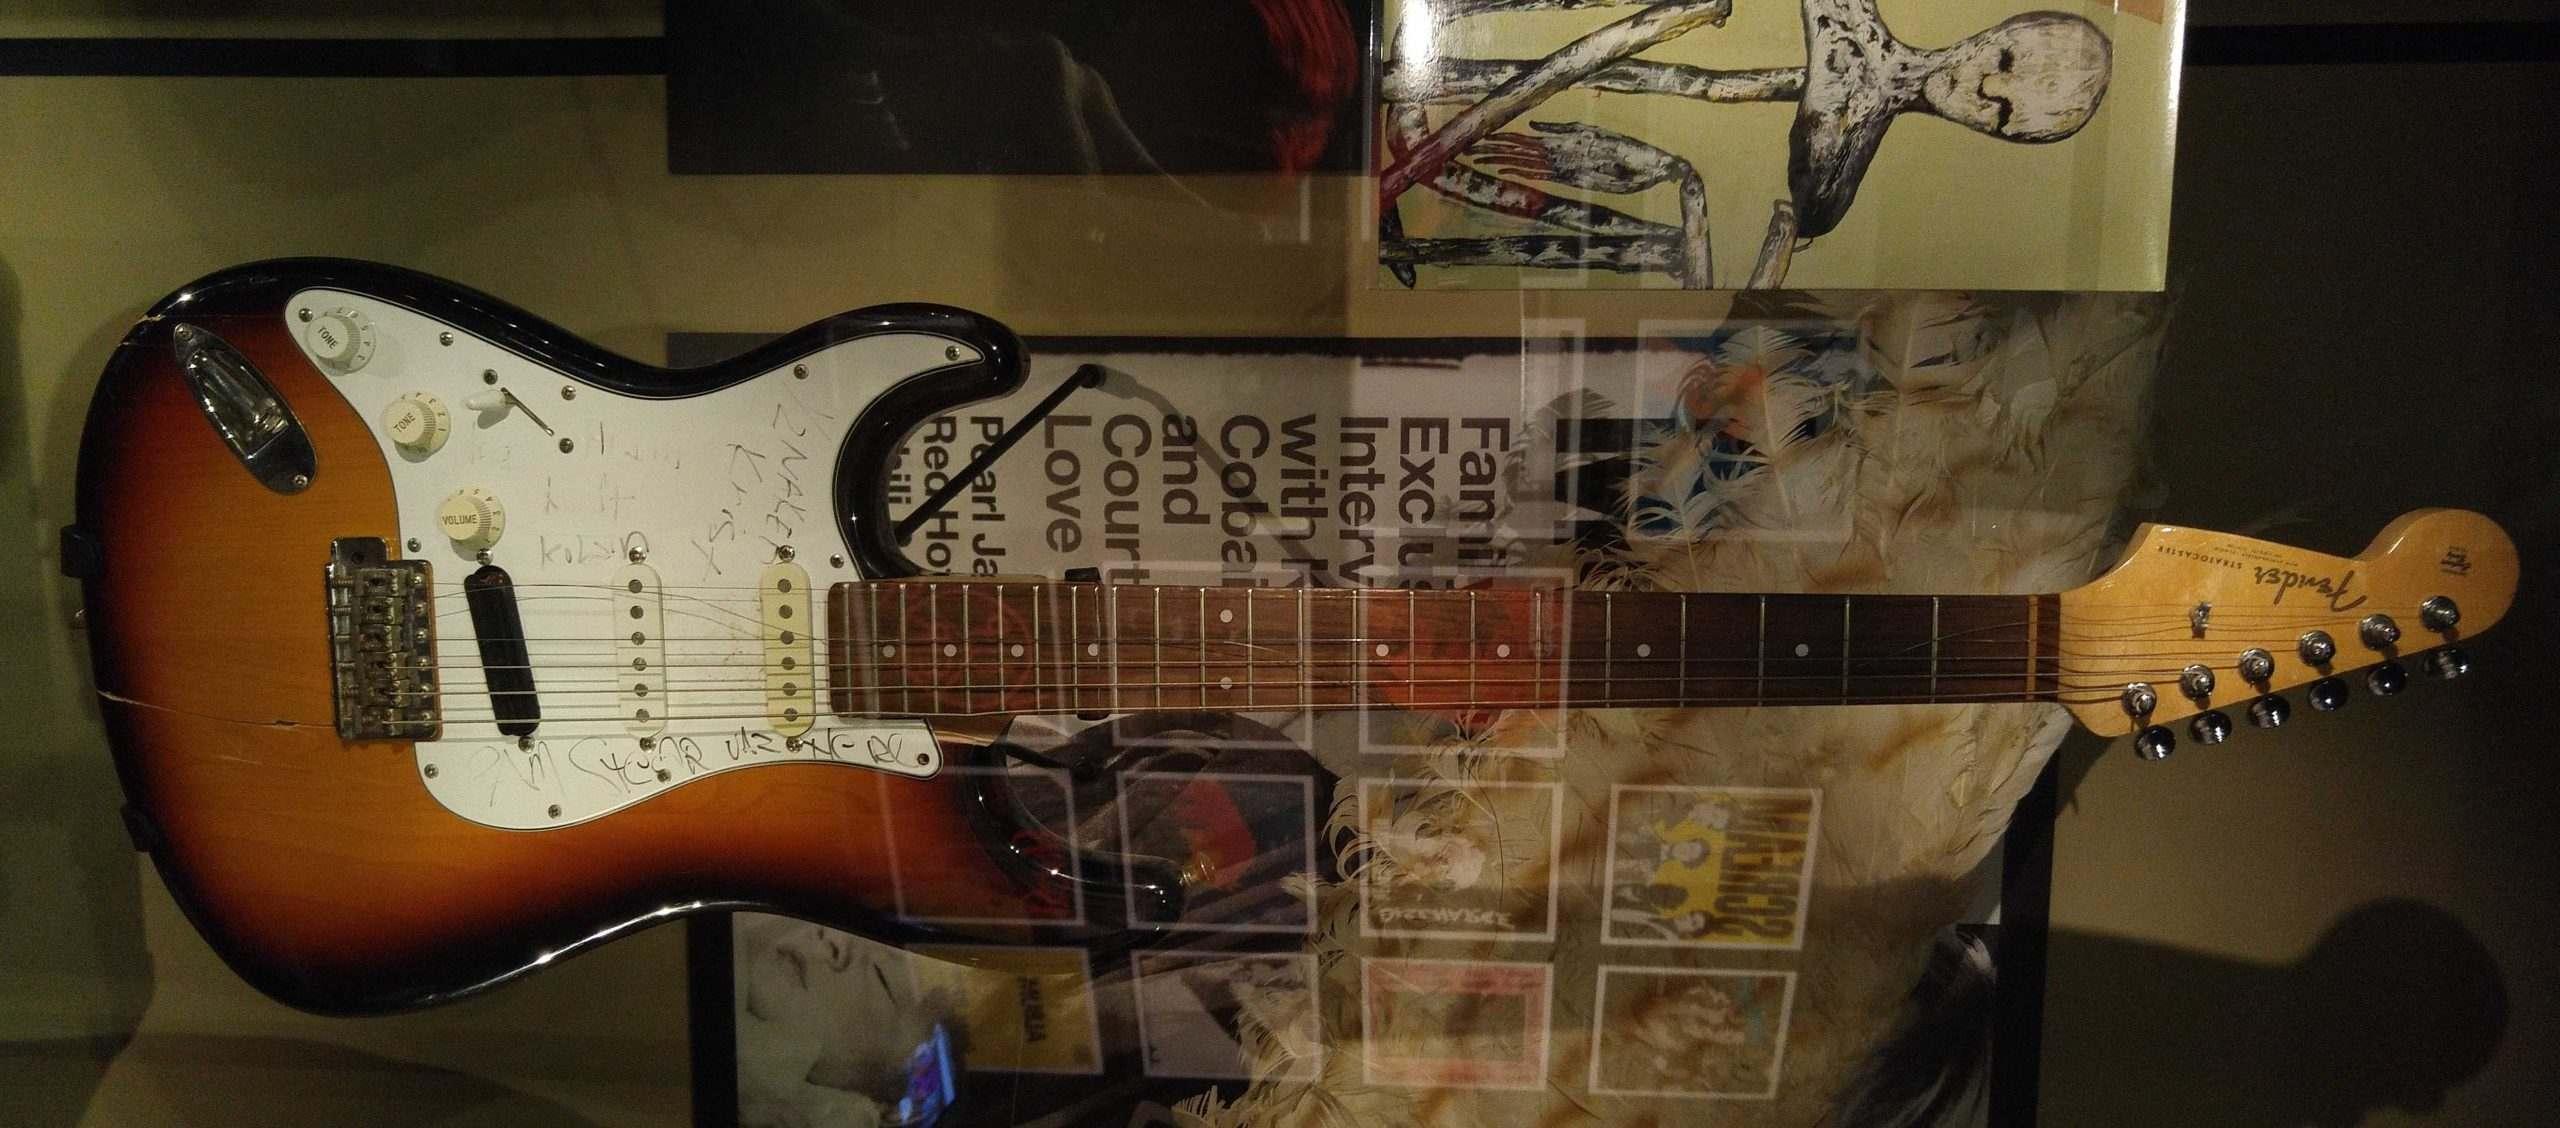 top-10-guitar-dien-danh-cho-nguoi-moi-choi-kurt-cobain-fender-stratocaster